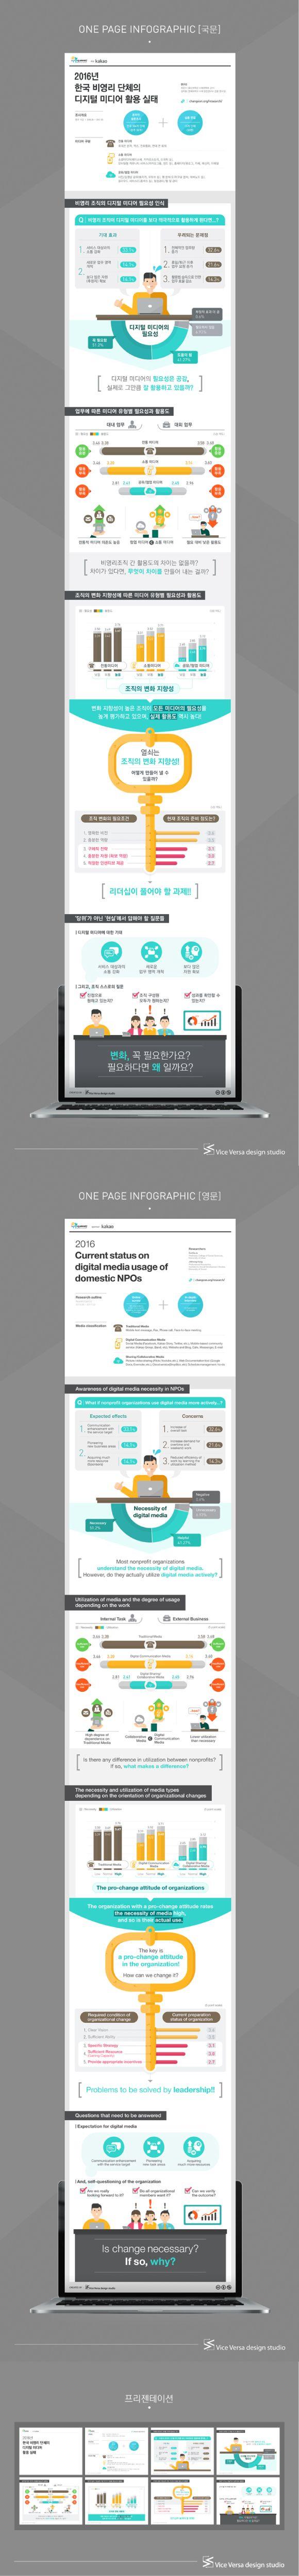 [infographic] '2016 한국 비영리 단체의 디지털 미디어 활용 실태'